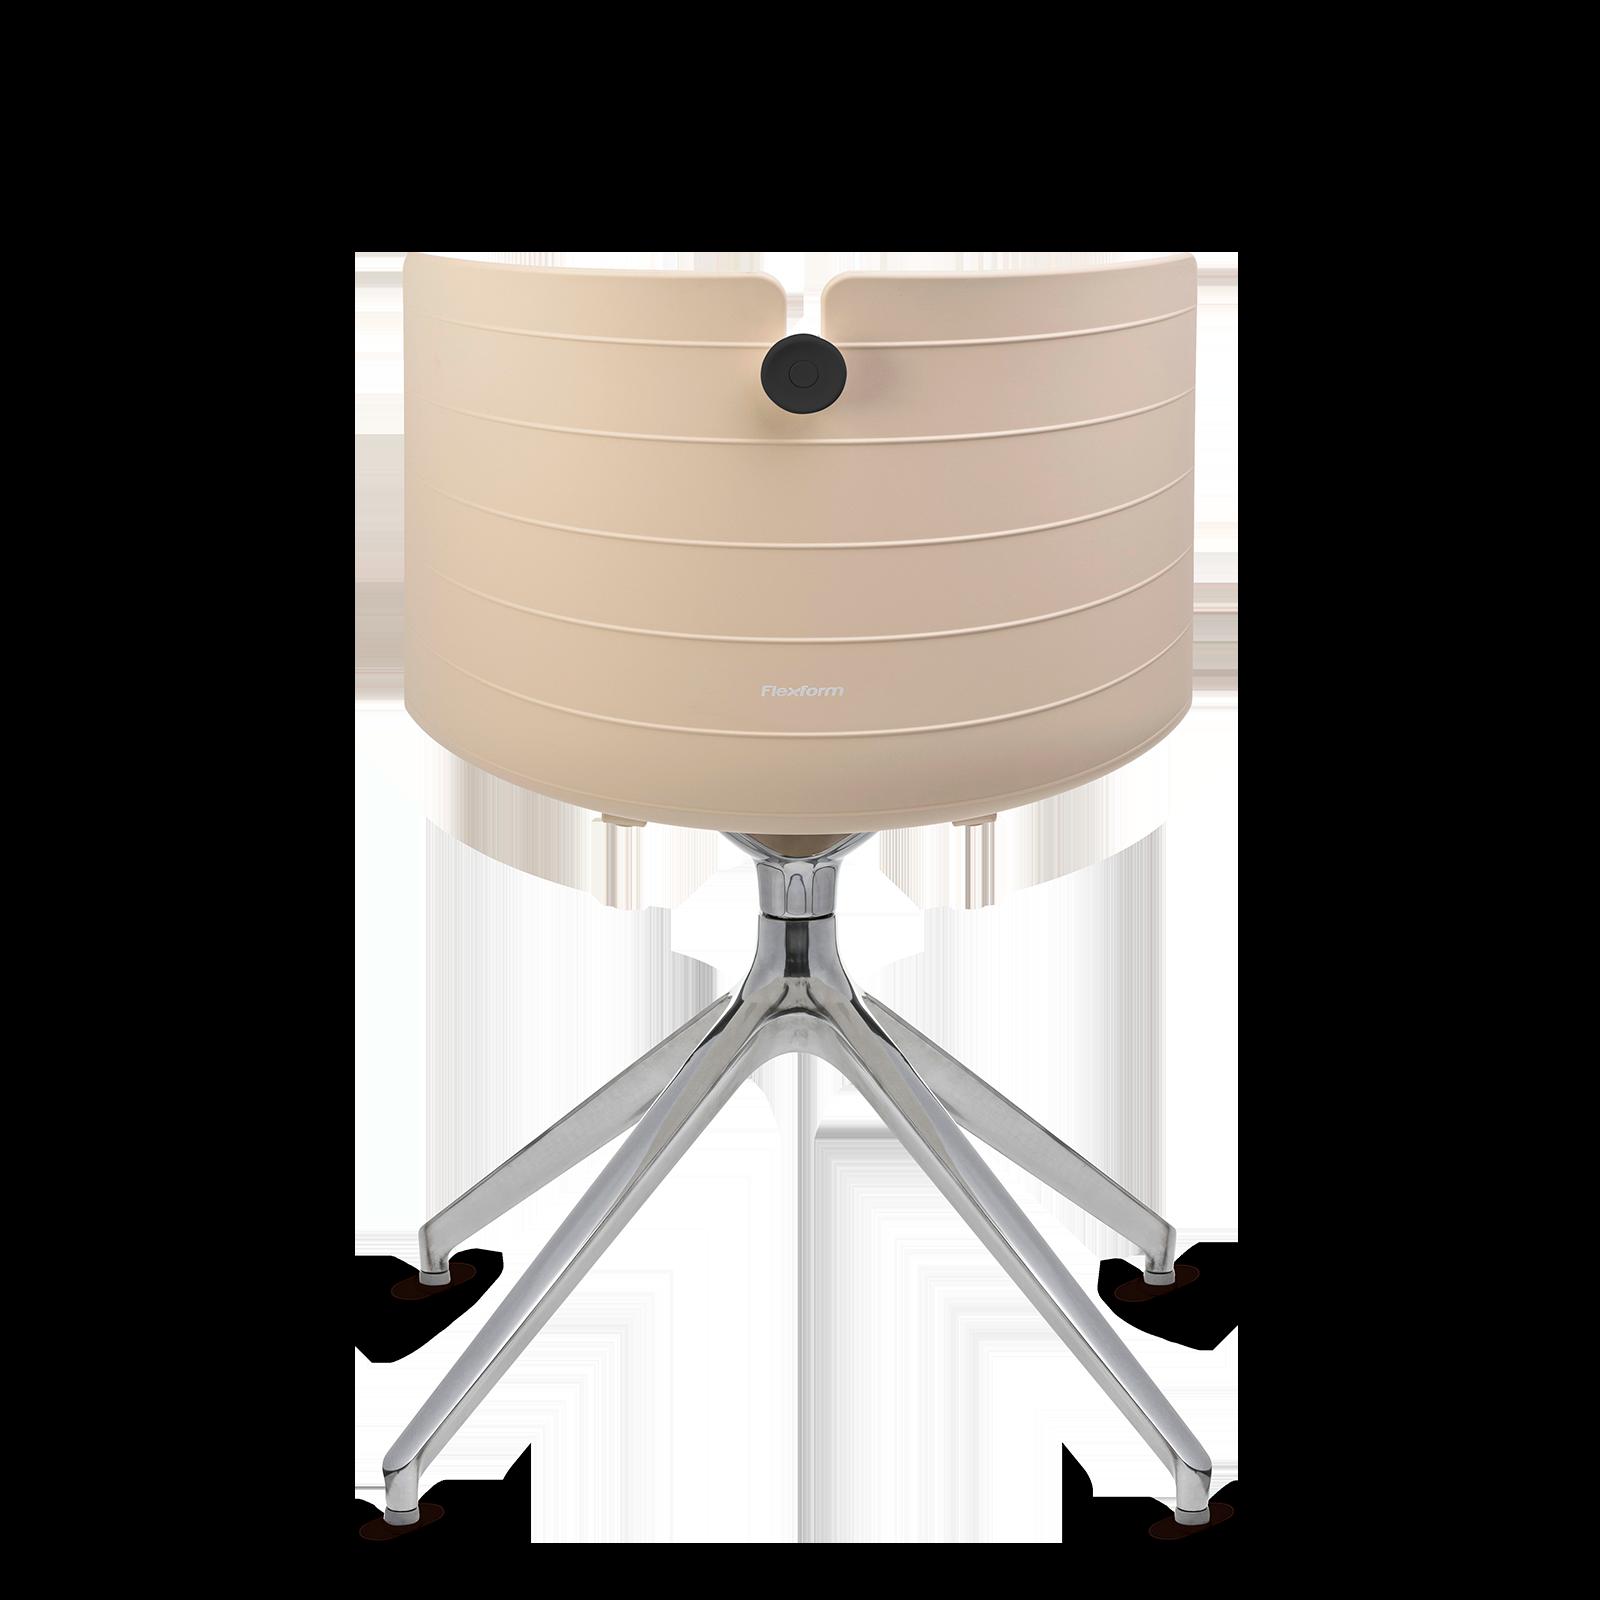 Cadeira Mork Sandy Black Piramidal